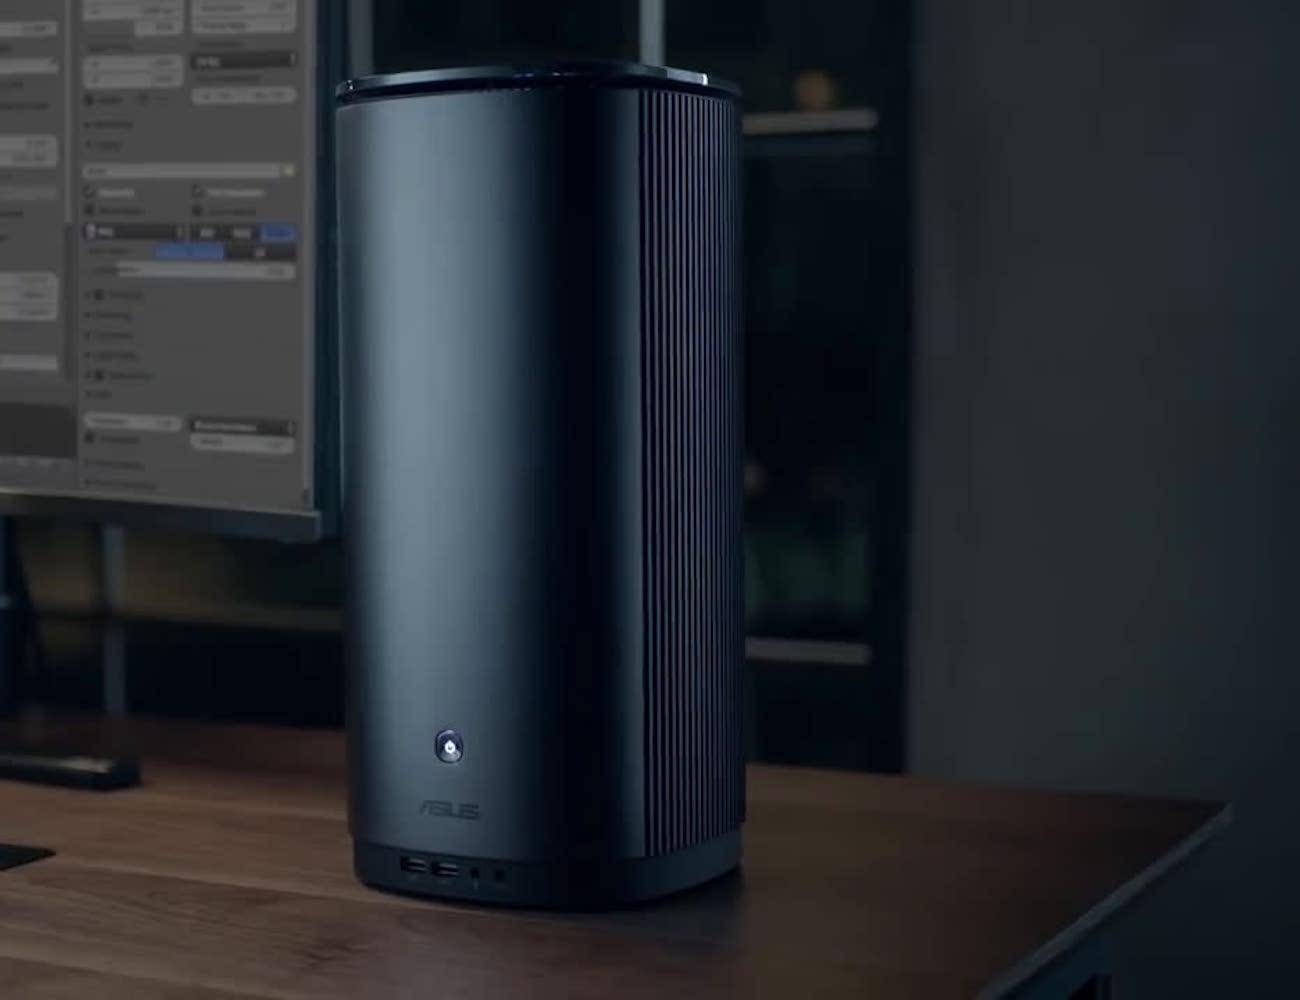 ASUS ProArt PA90 Mini PC